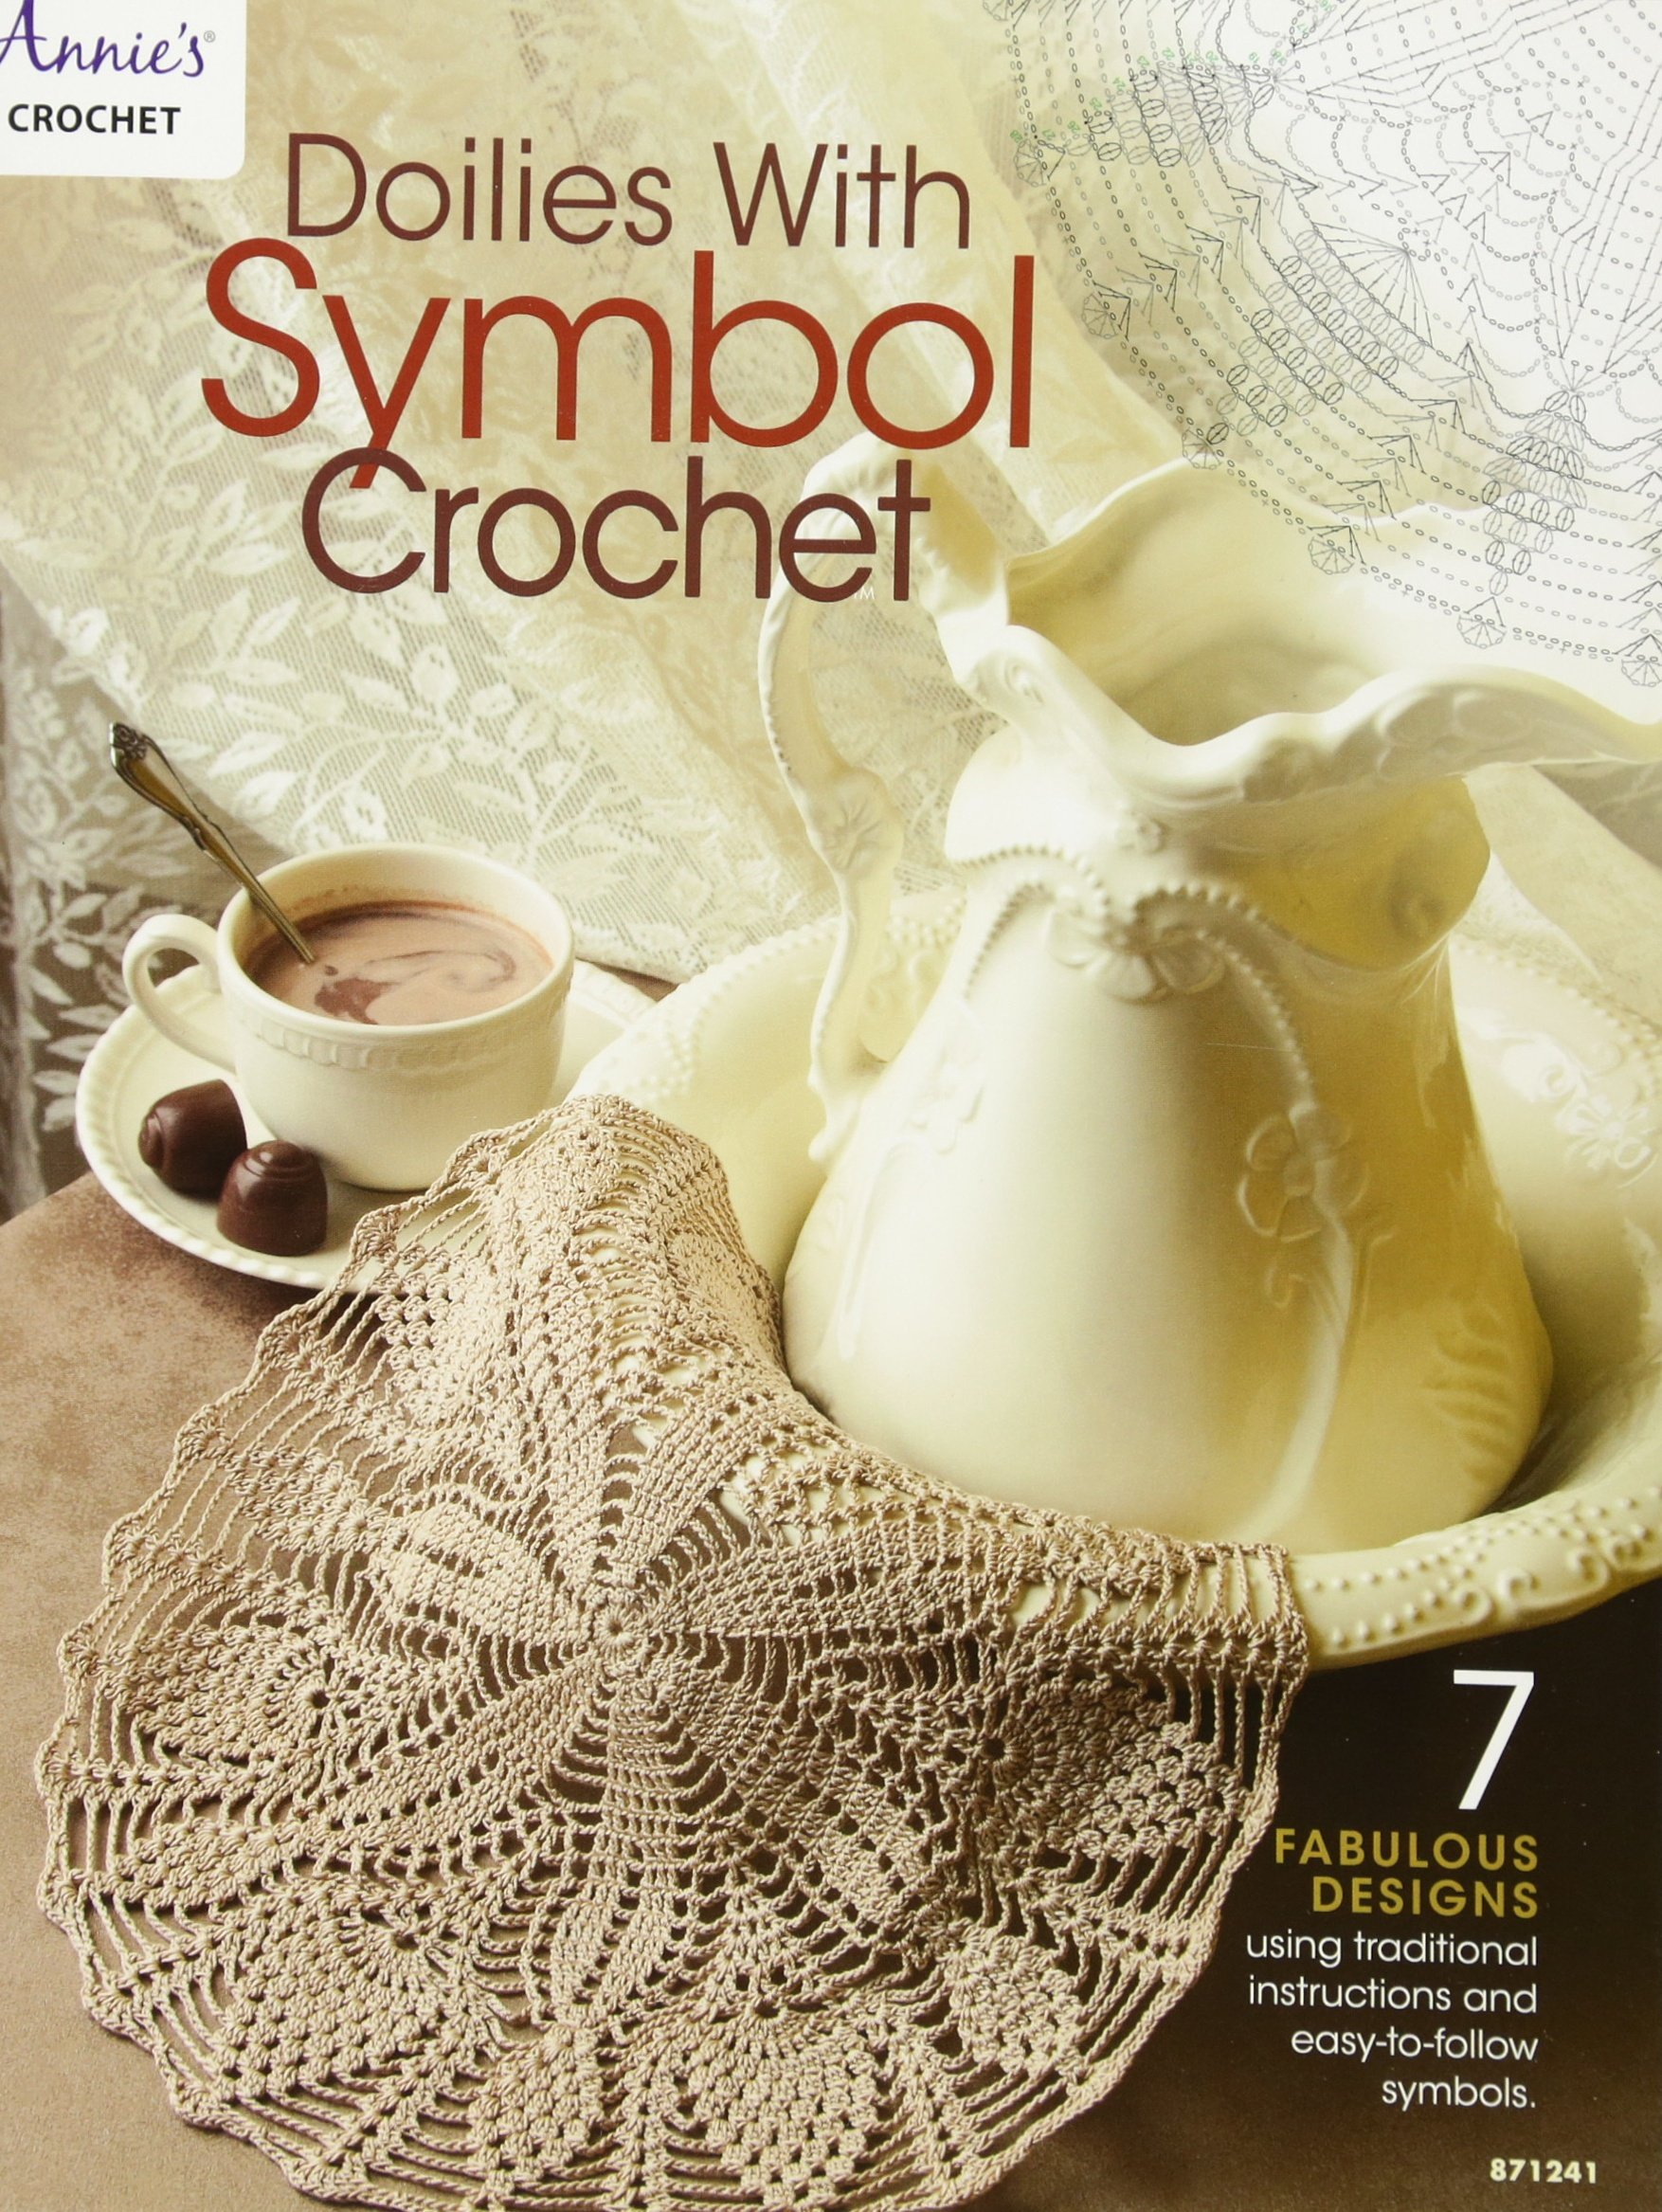 Doilies with Symbol Crochet (Annie's Crochet) Paperback – 15 Jan 2013